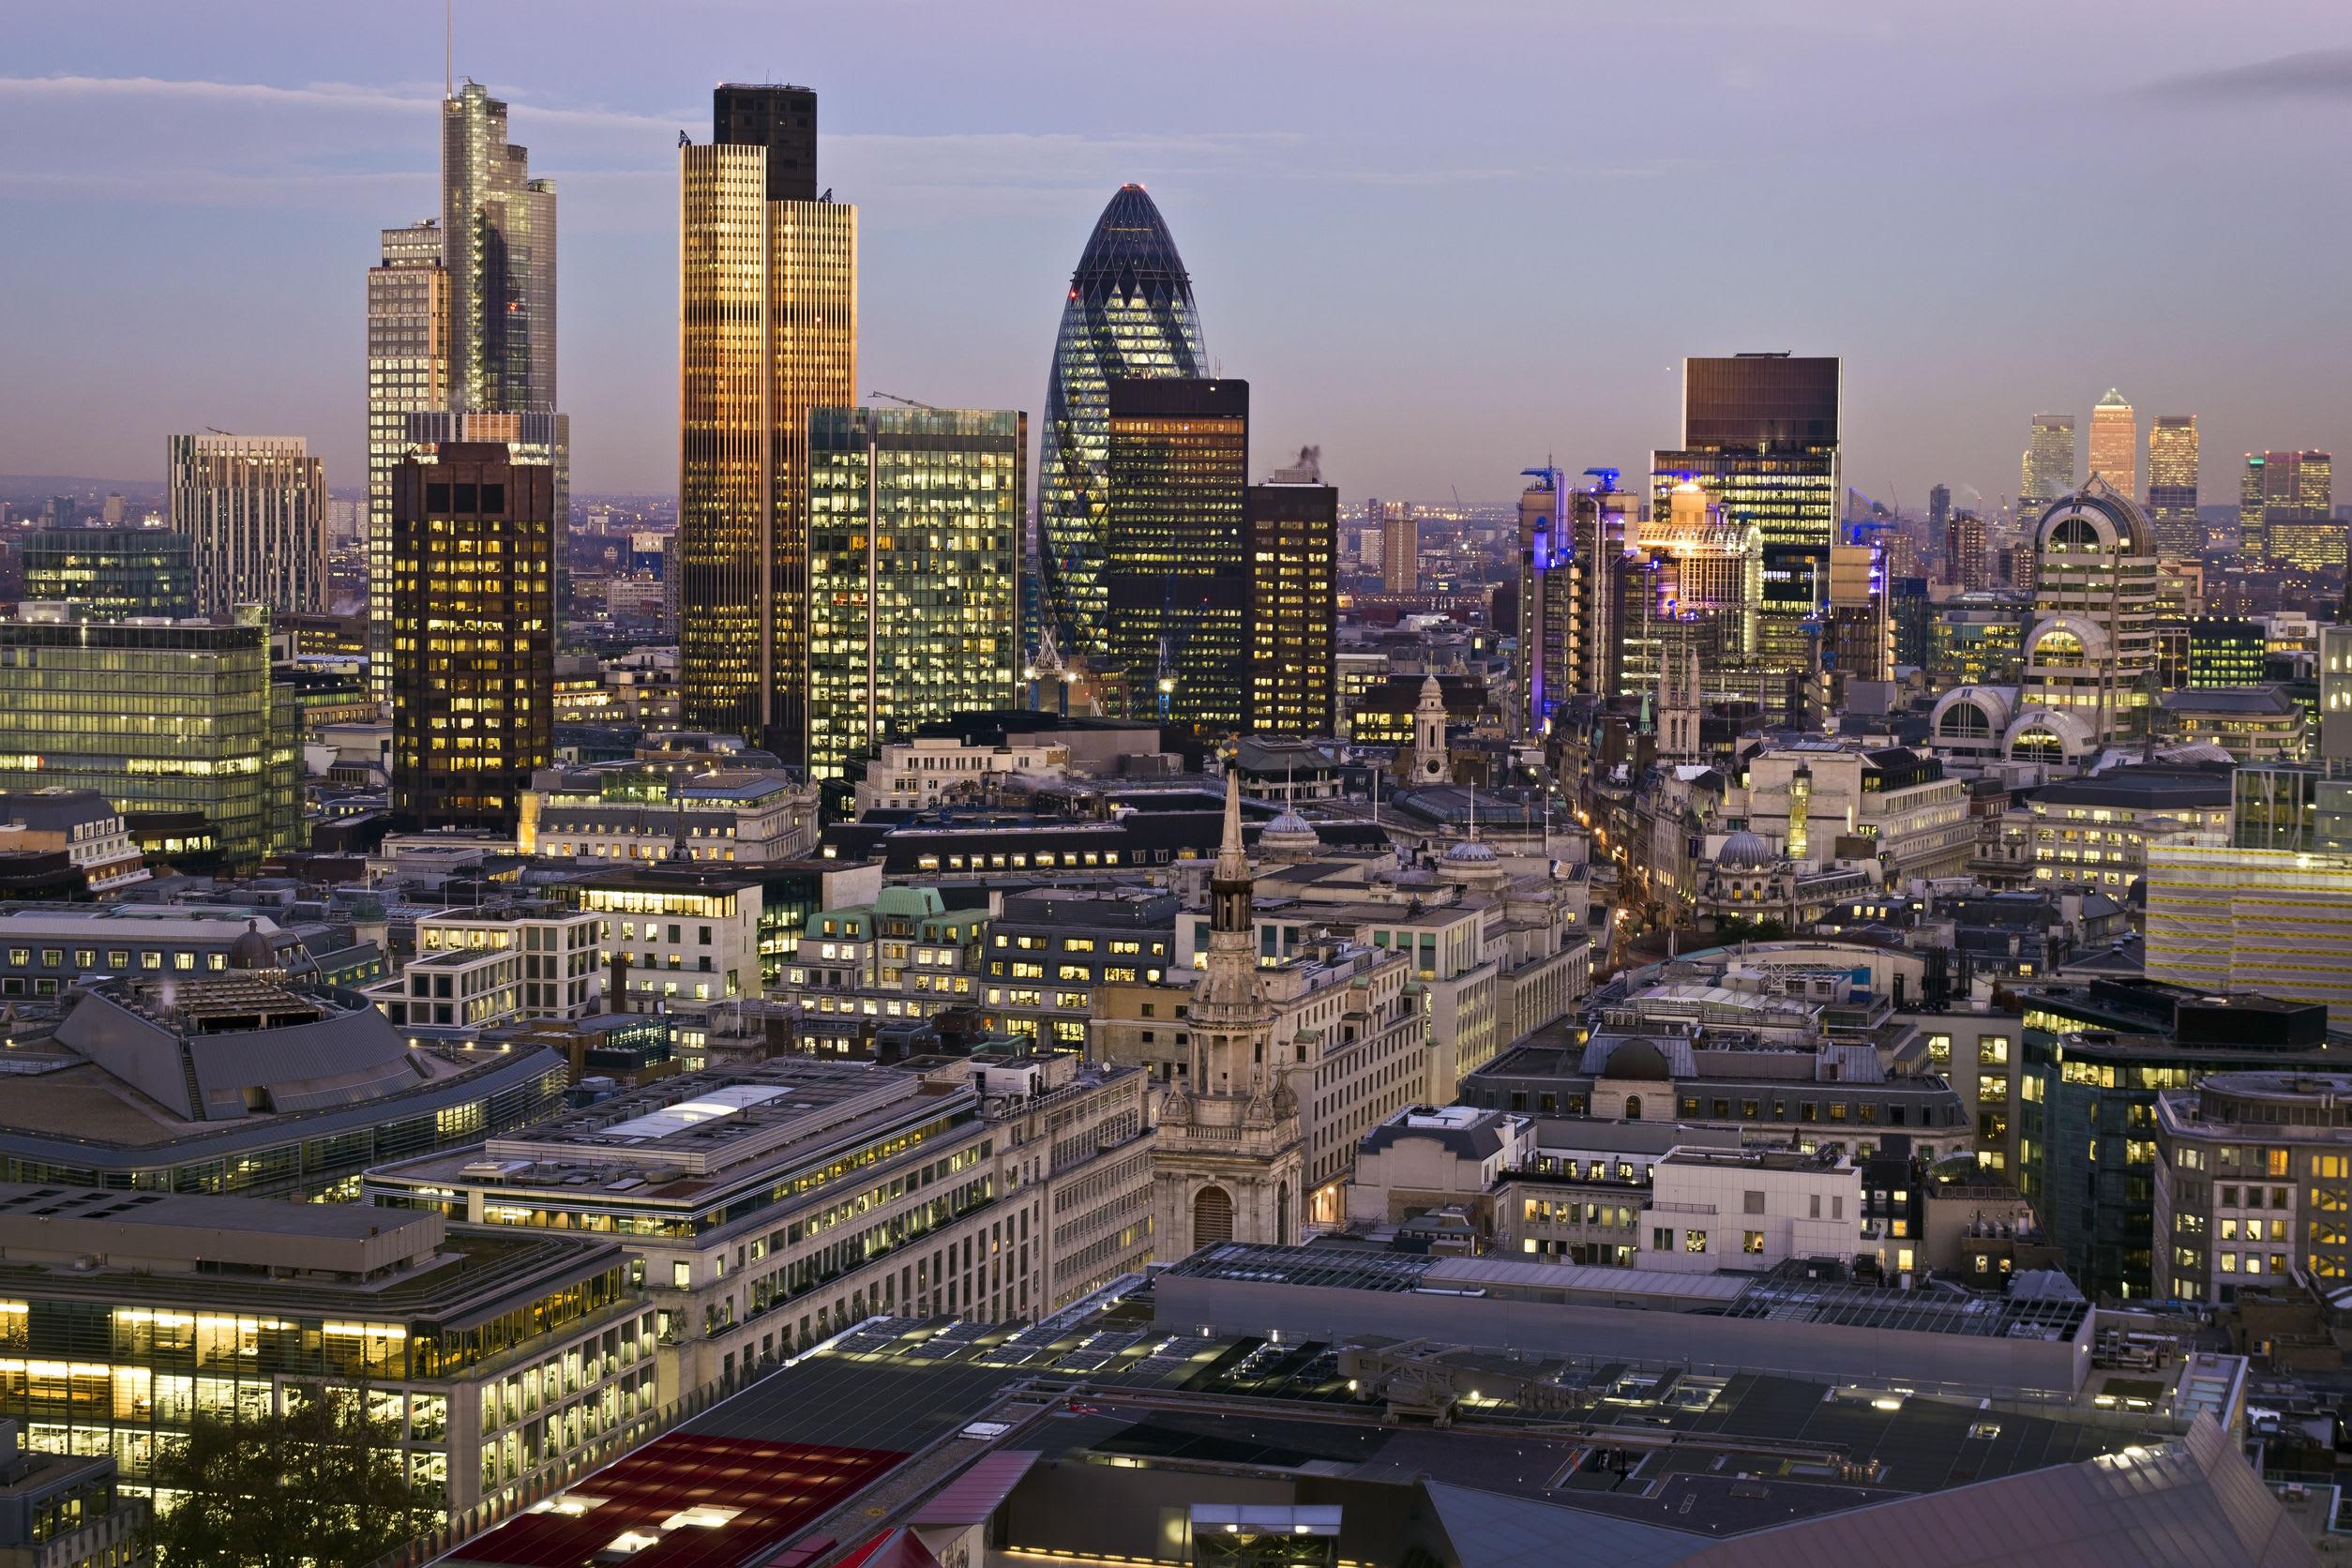 Citi UK/London Image